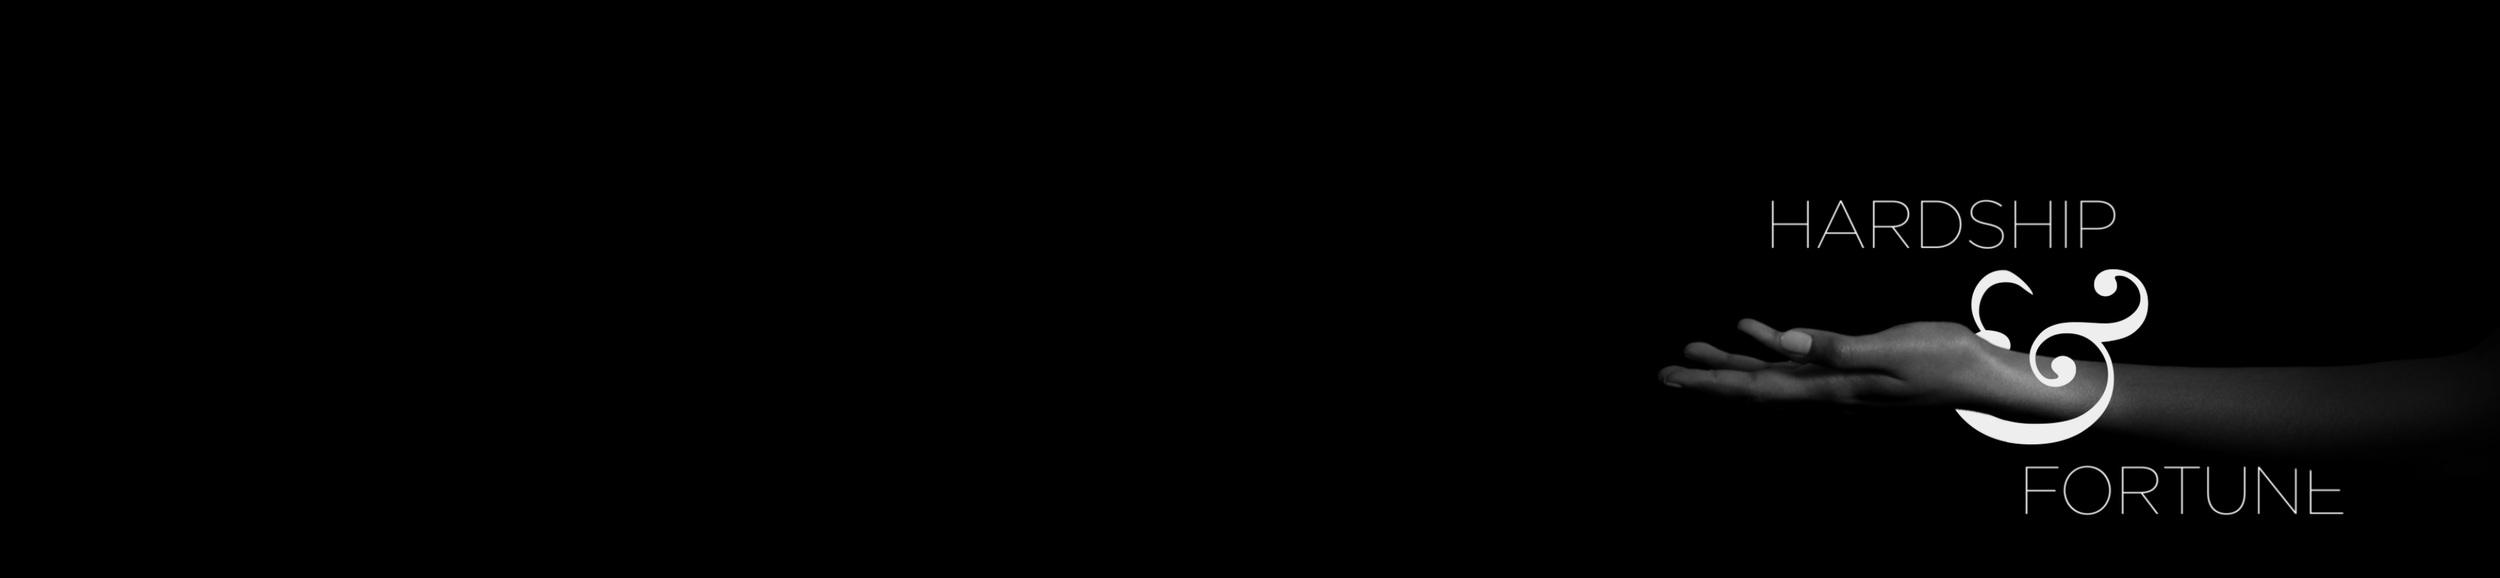 PH_WALL_3PROJECTORS_H900_FINAL_AUD01_01029.jpg